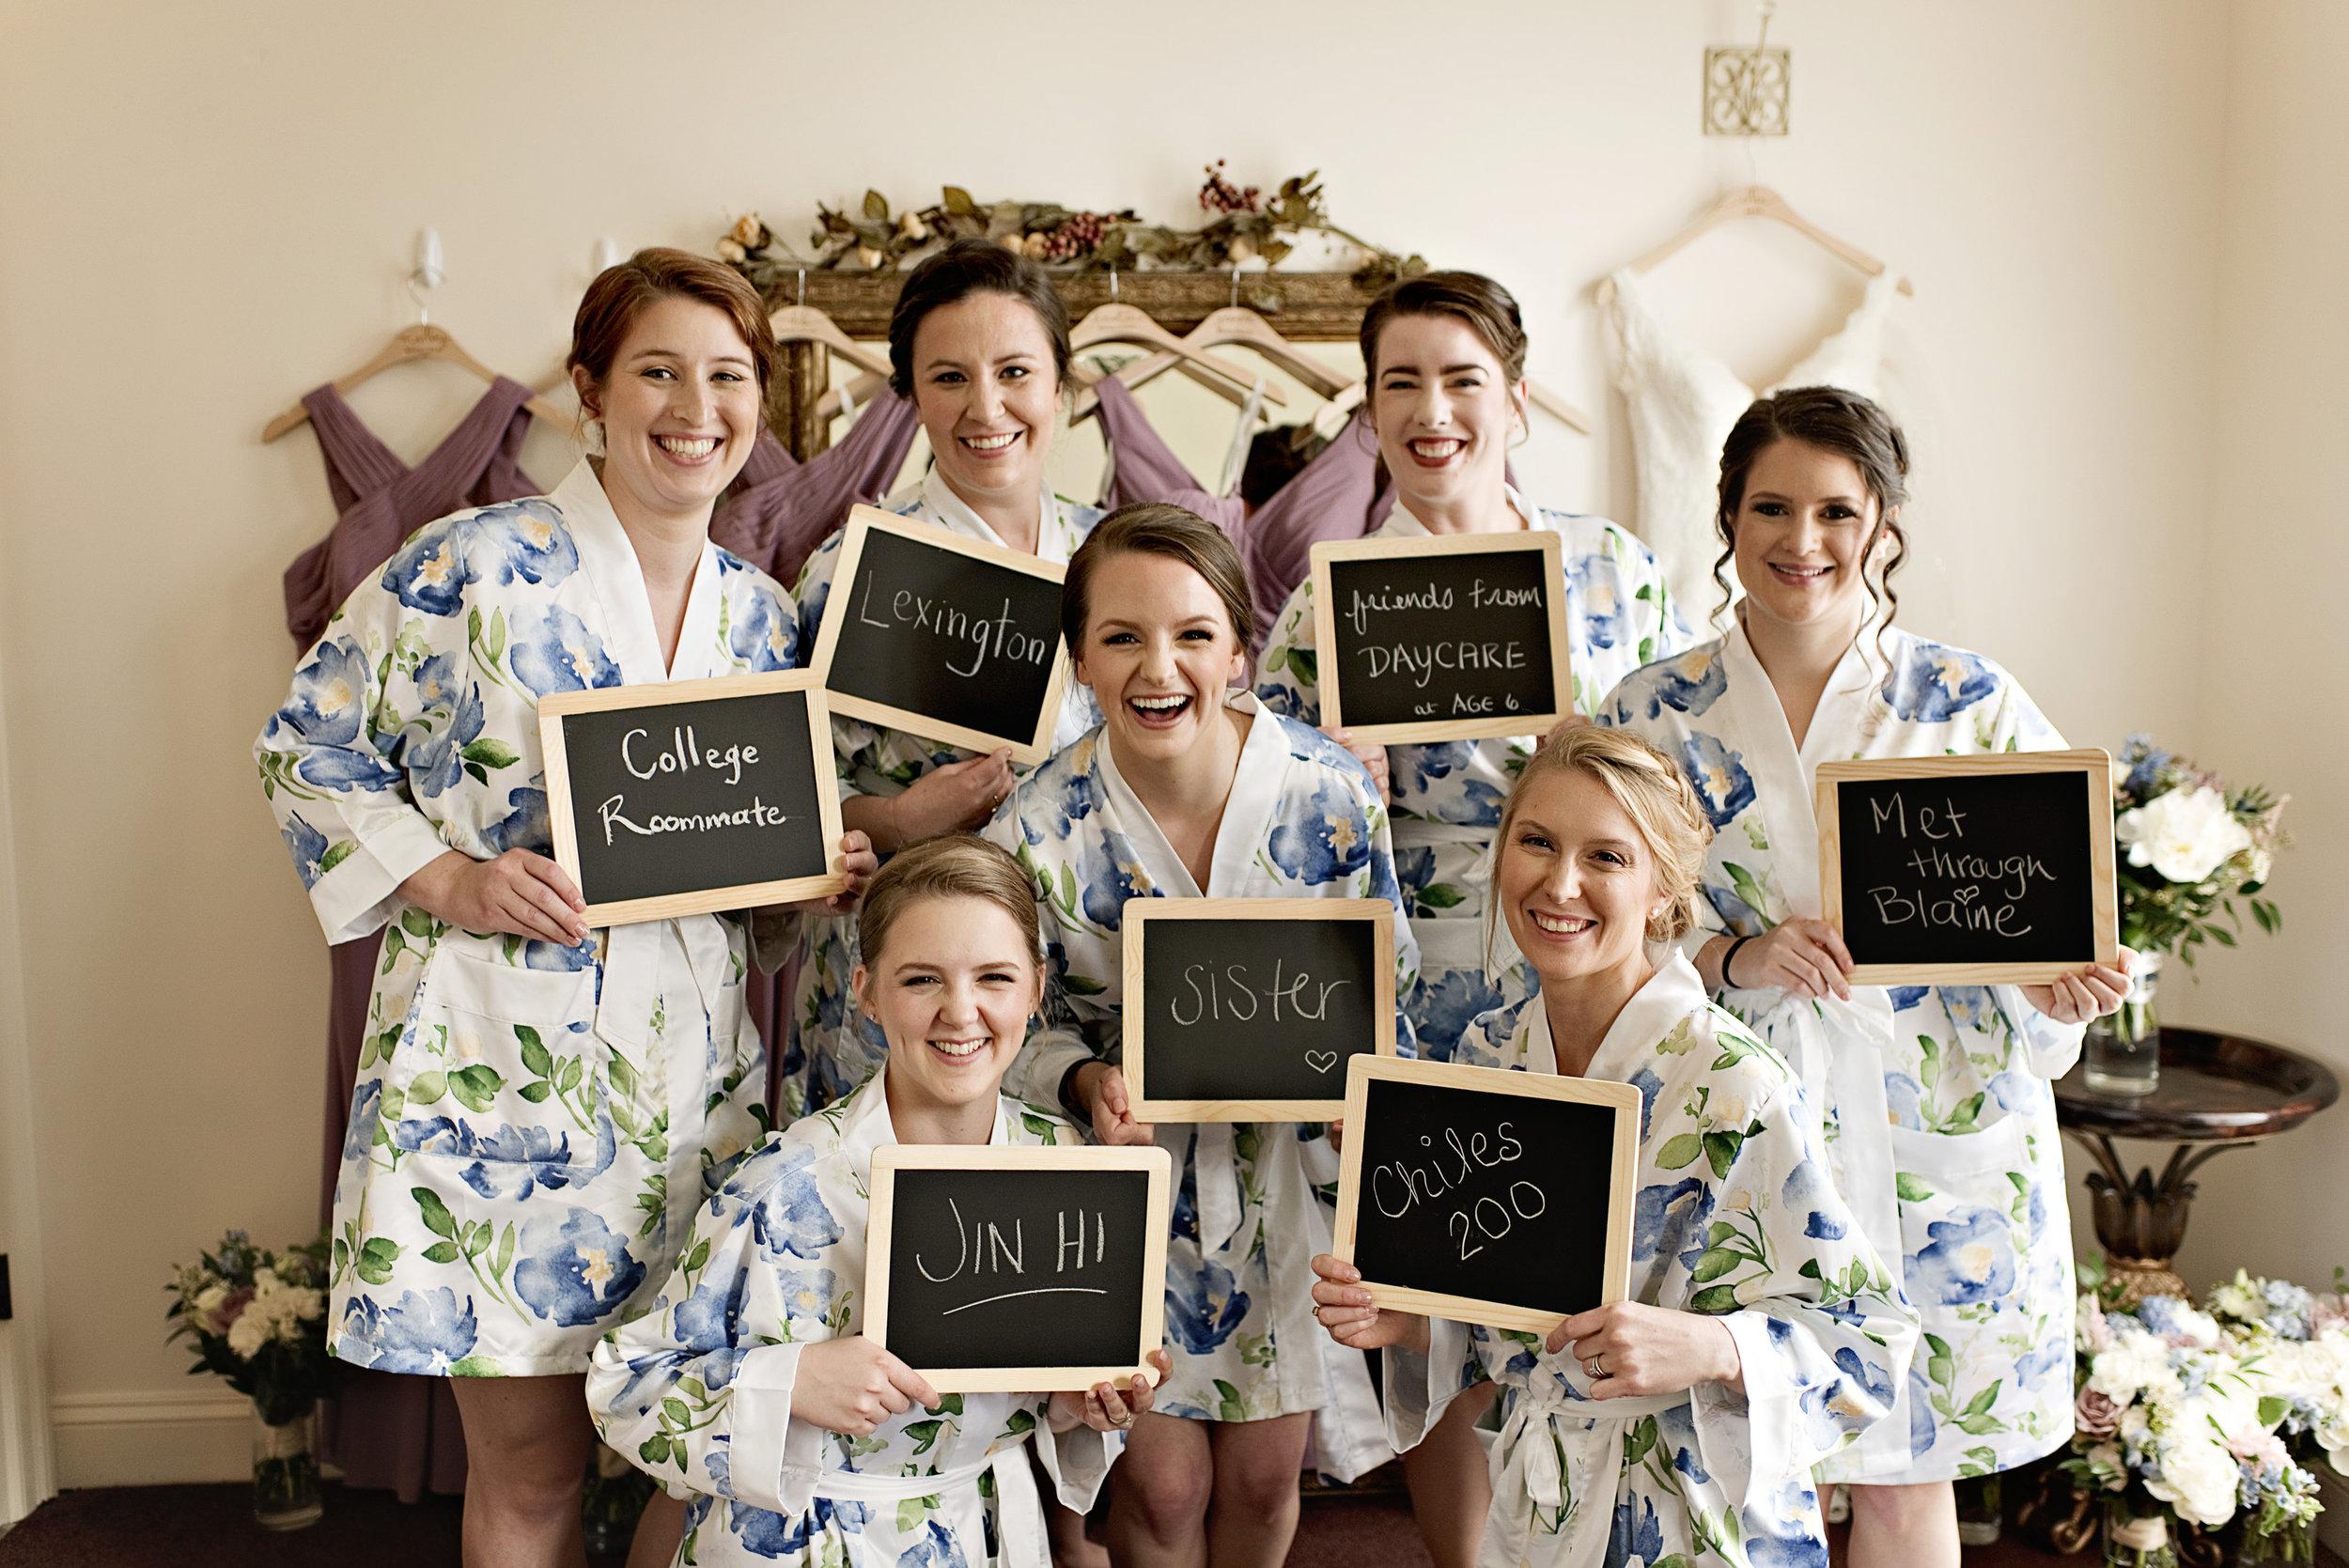 Ellen Blaine Wedding-0002.jpg